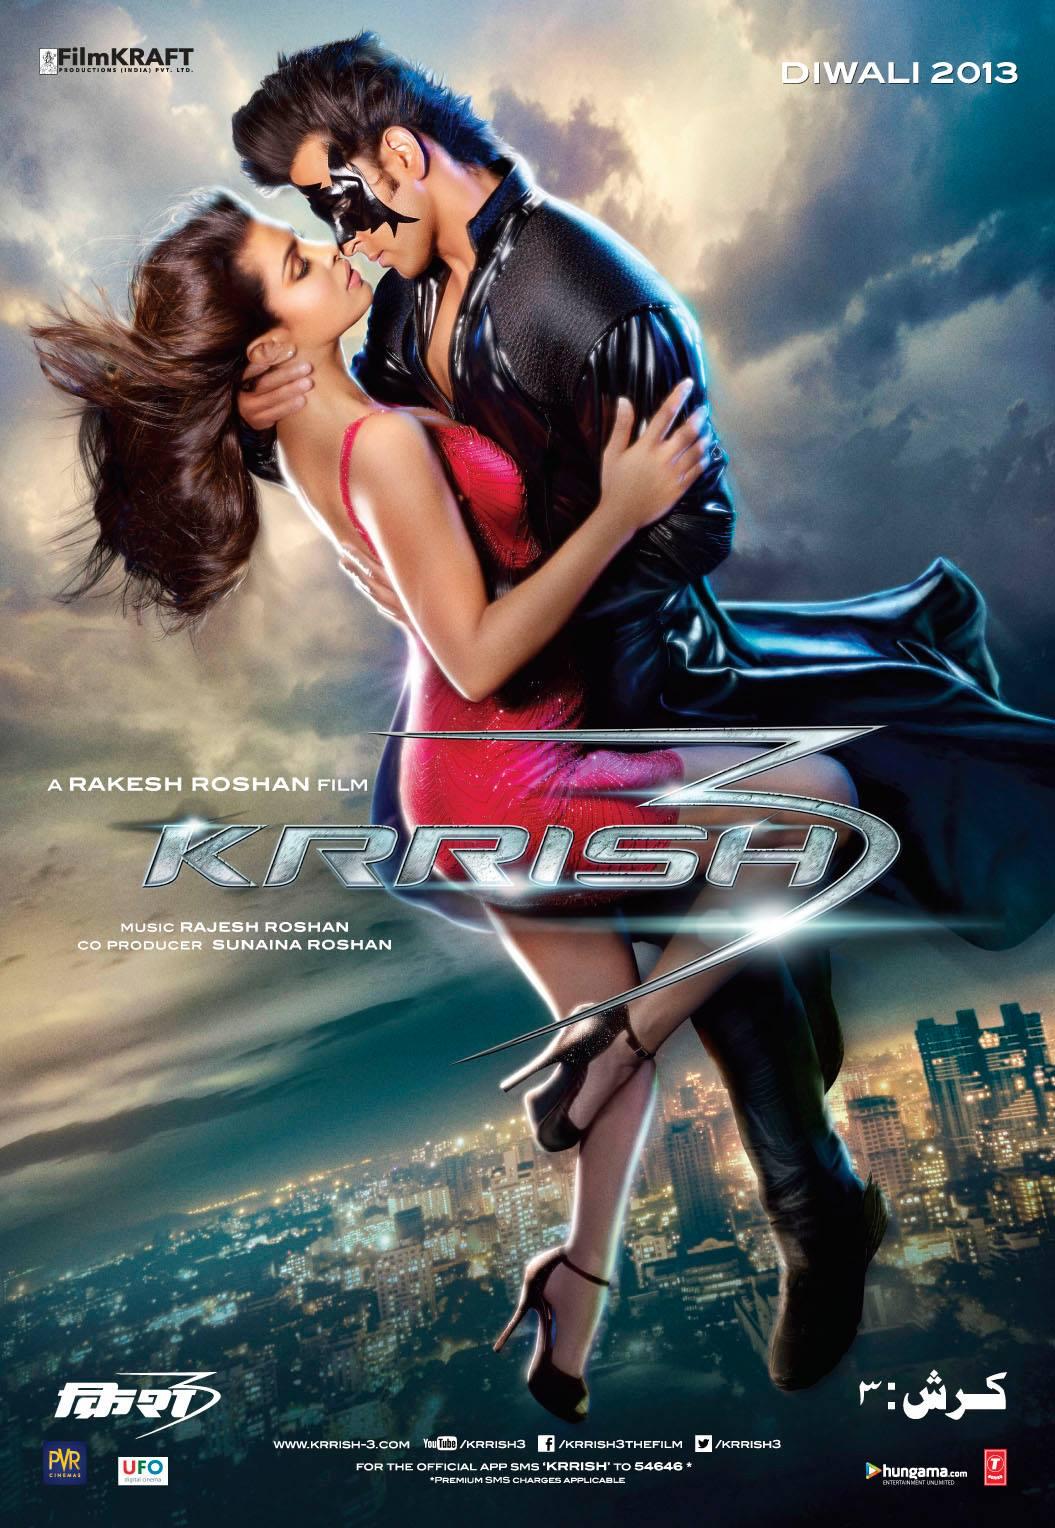 Krrish 3 Flights Tights And Movie Nights